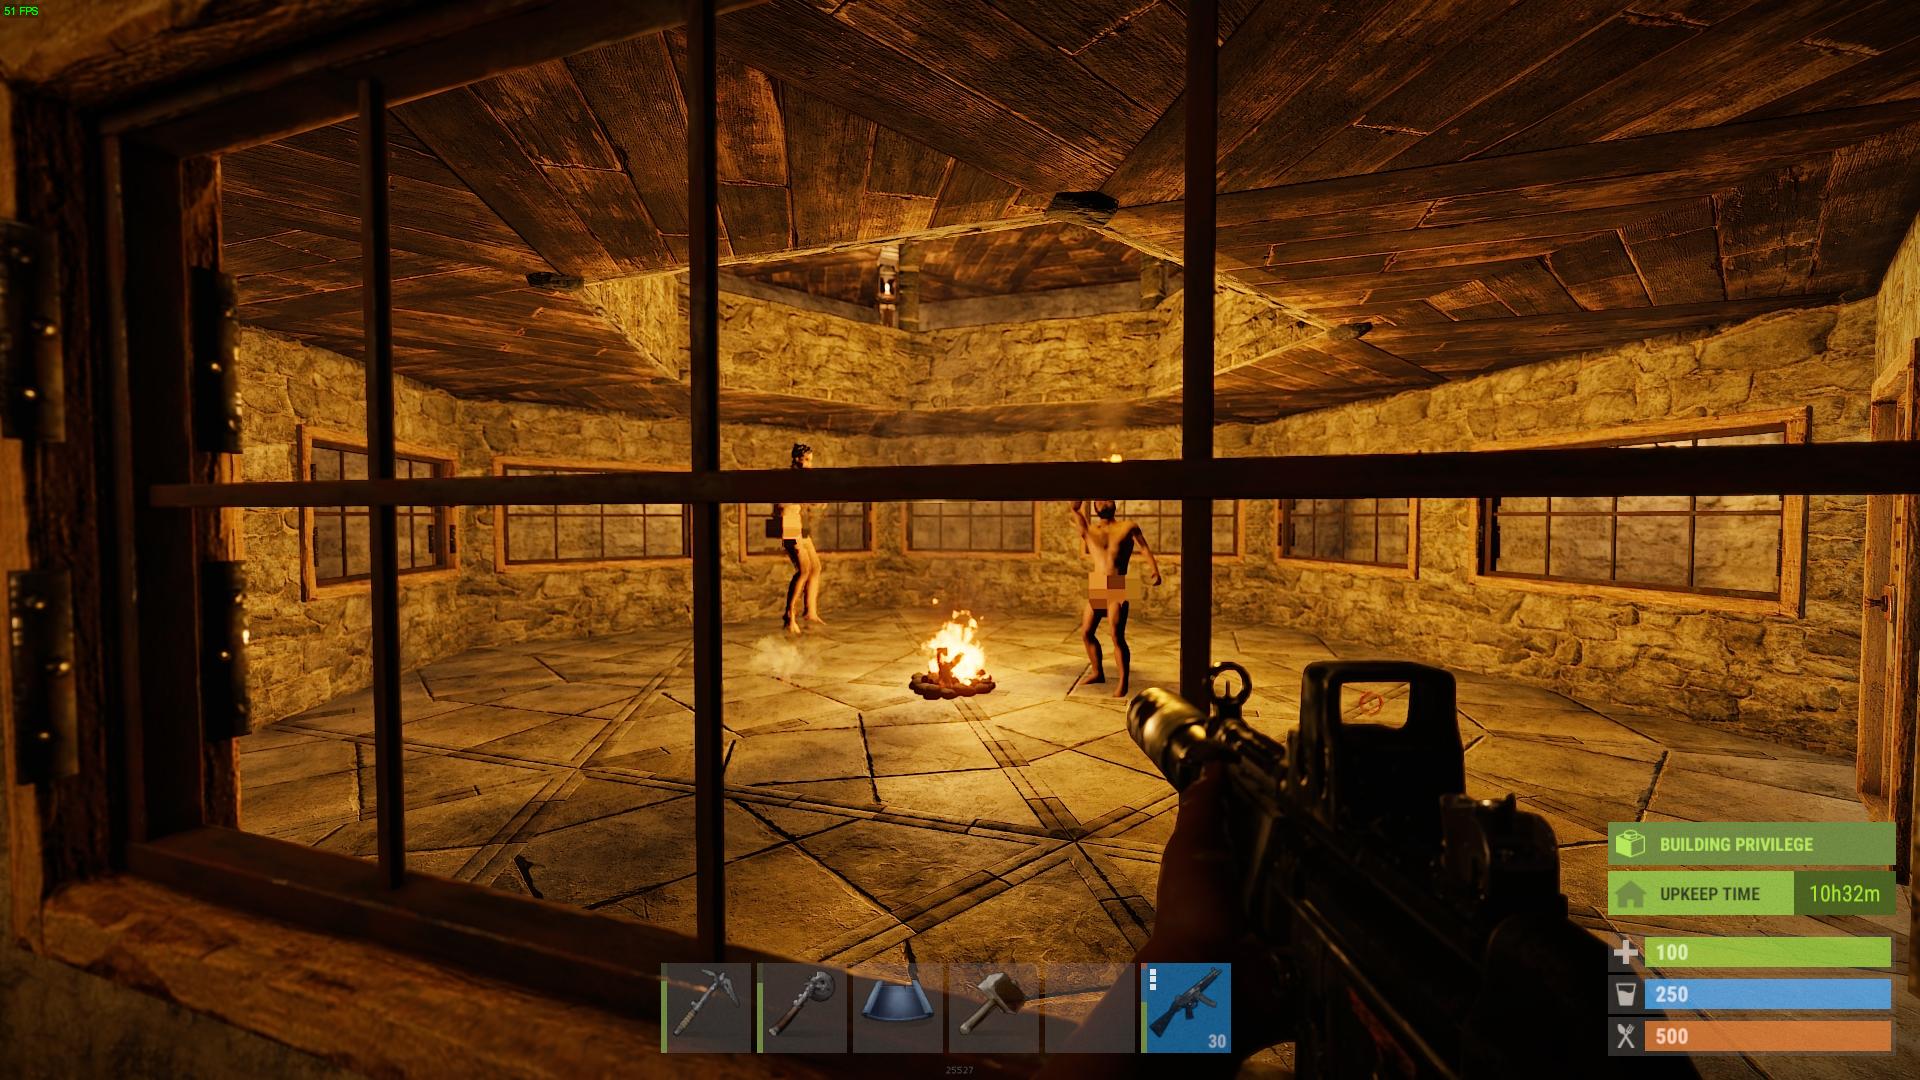 The fresh spawn fight club arena.